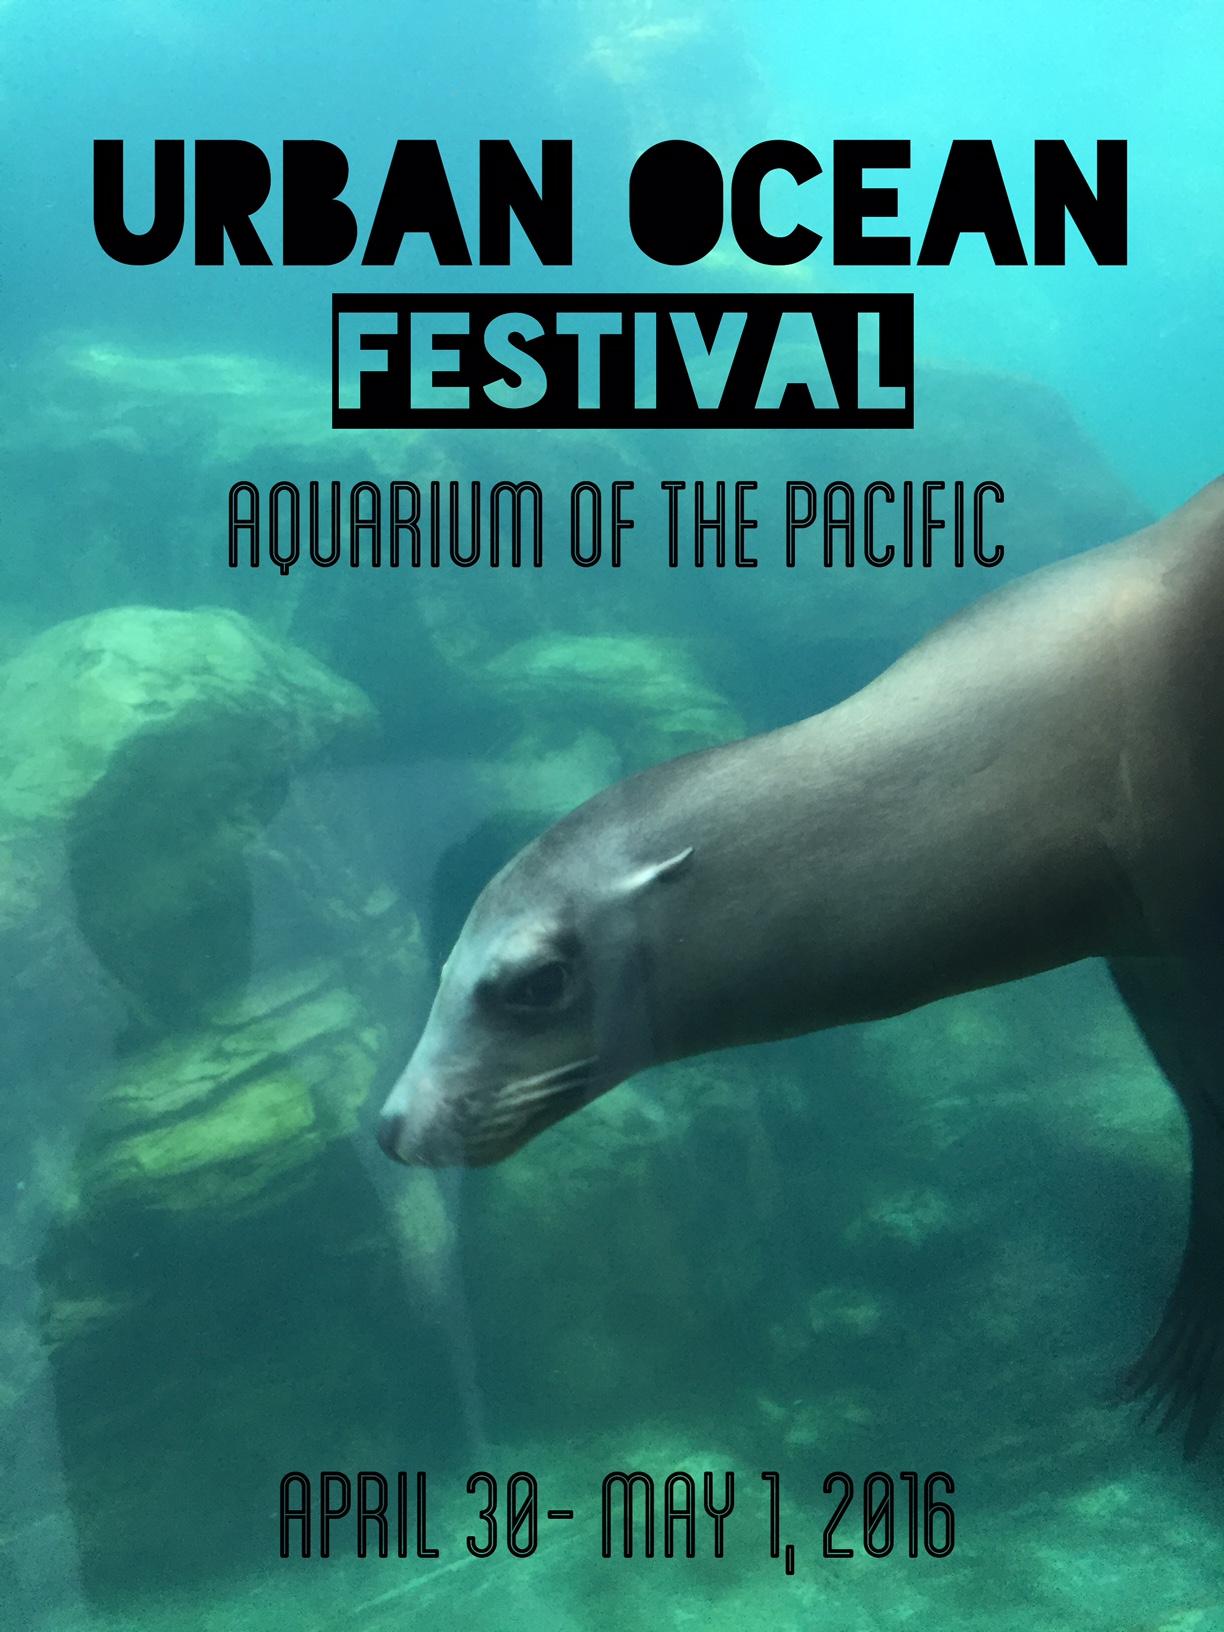 Urban Ocean Festival | Sea Lion image Marcie Taylor